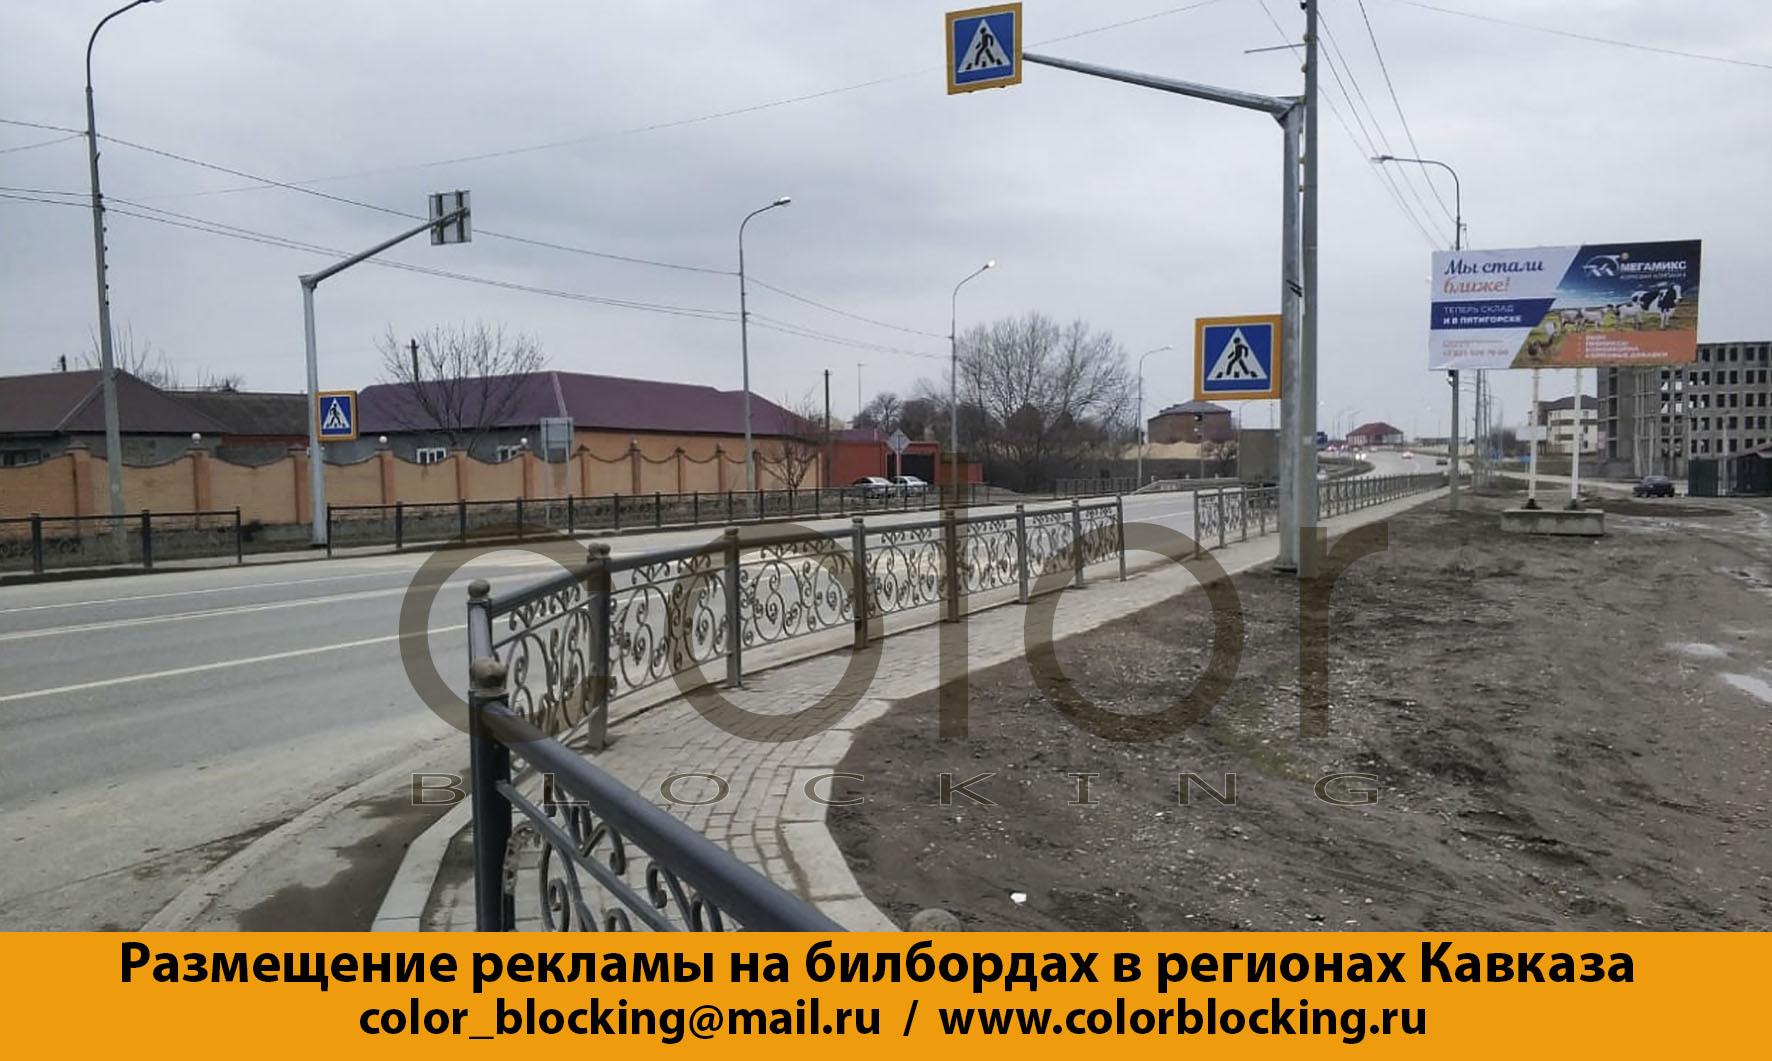 Реклама на билбордах на Кавказе Гудермес